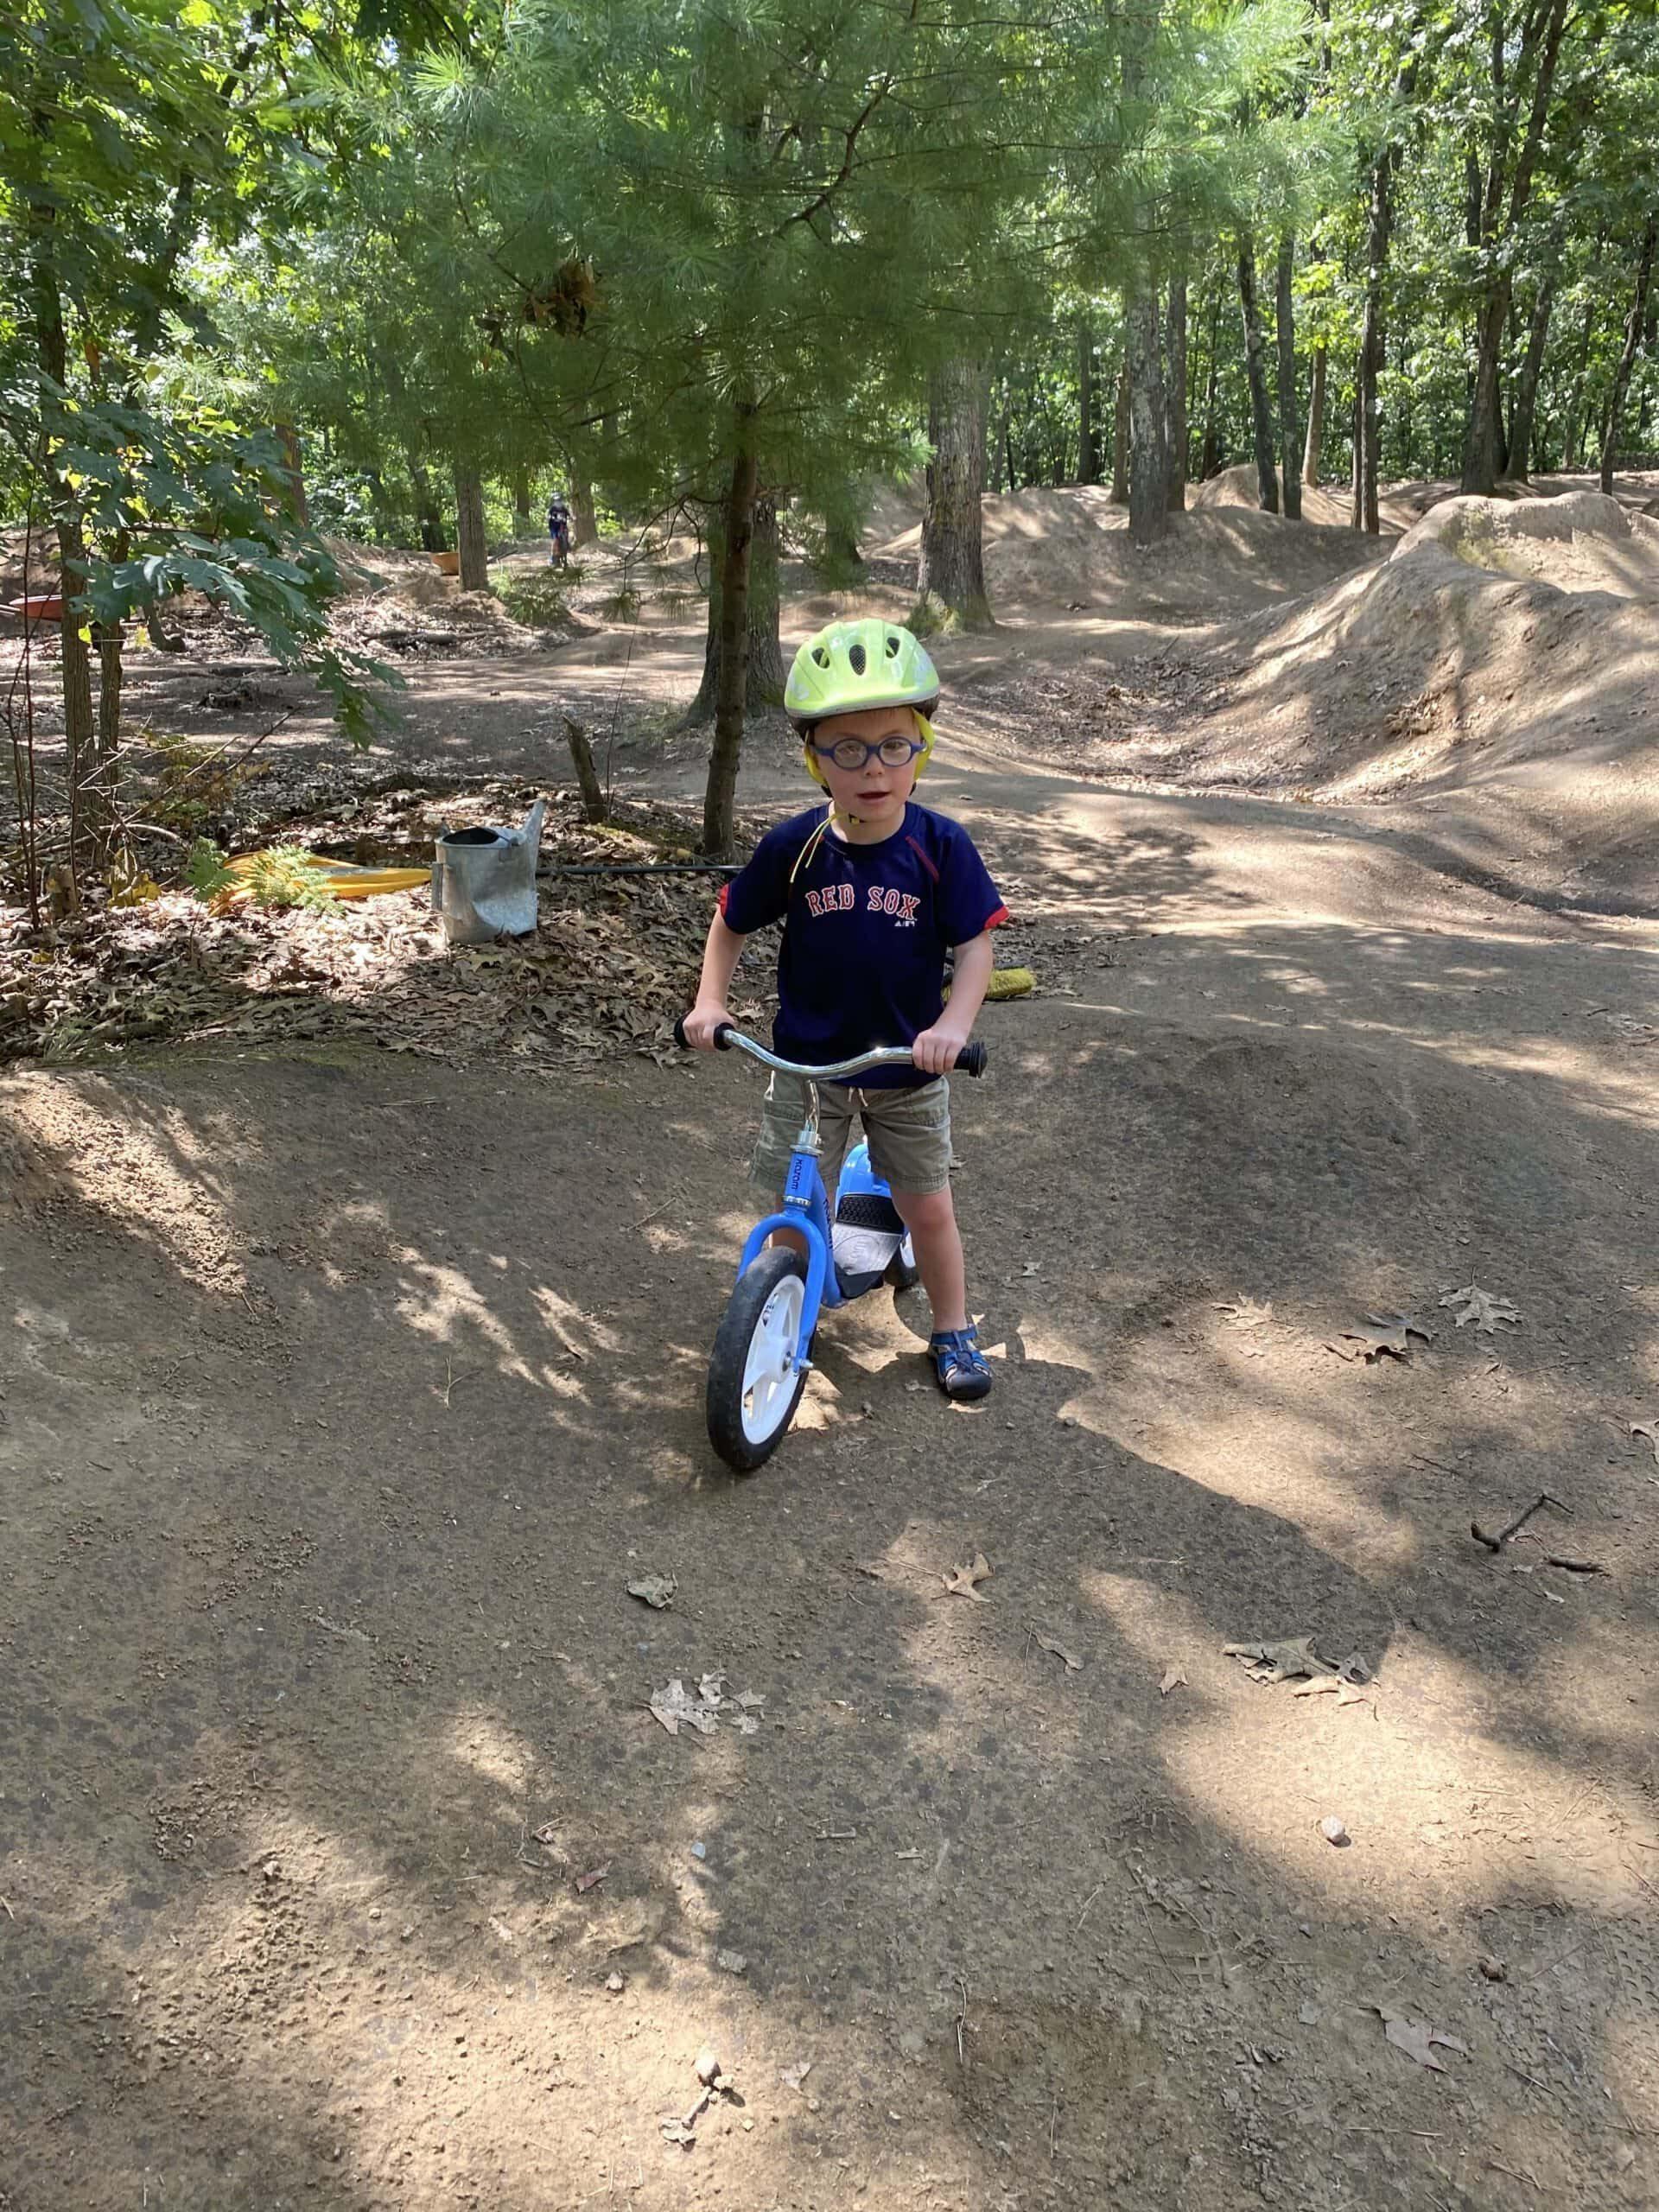 Kid on a dirt trail riding his bike